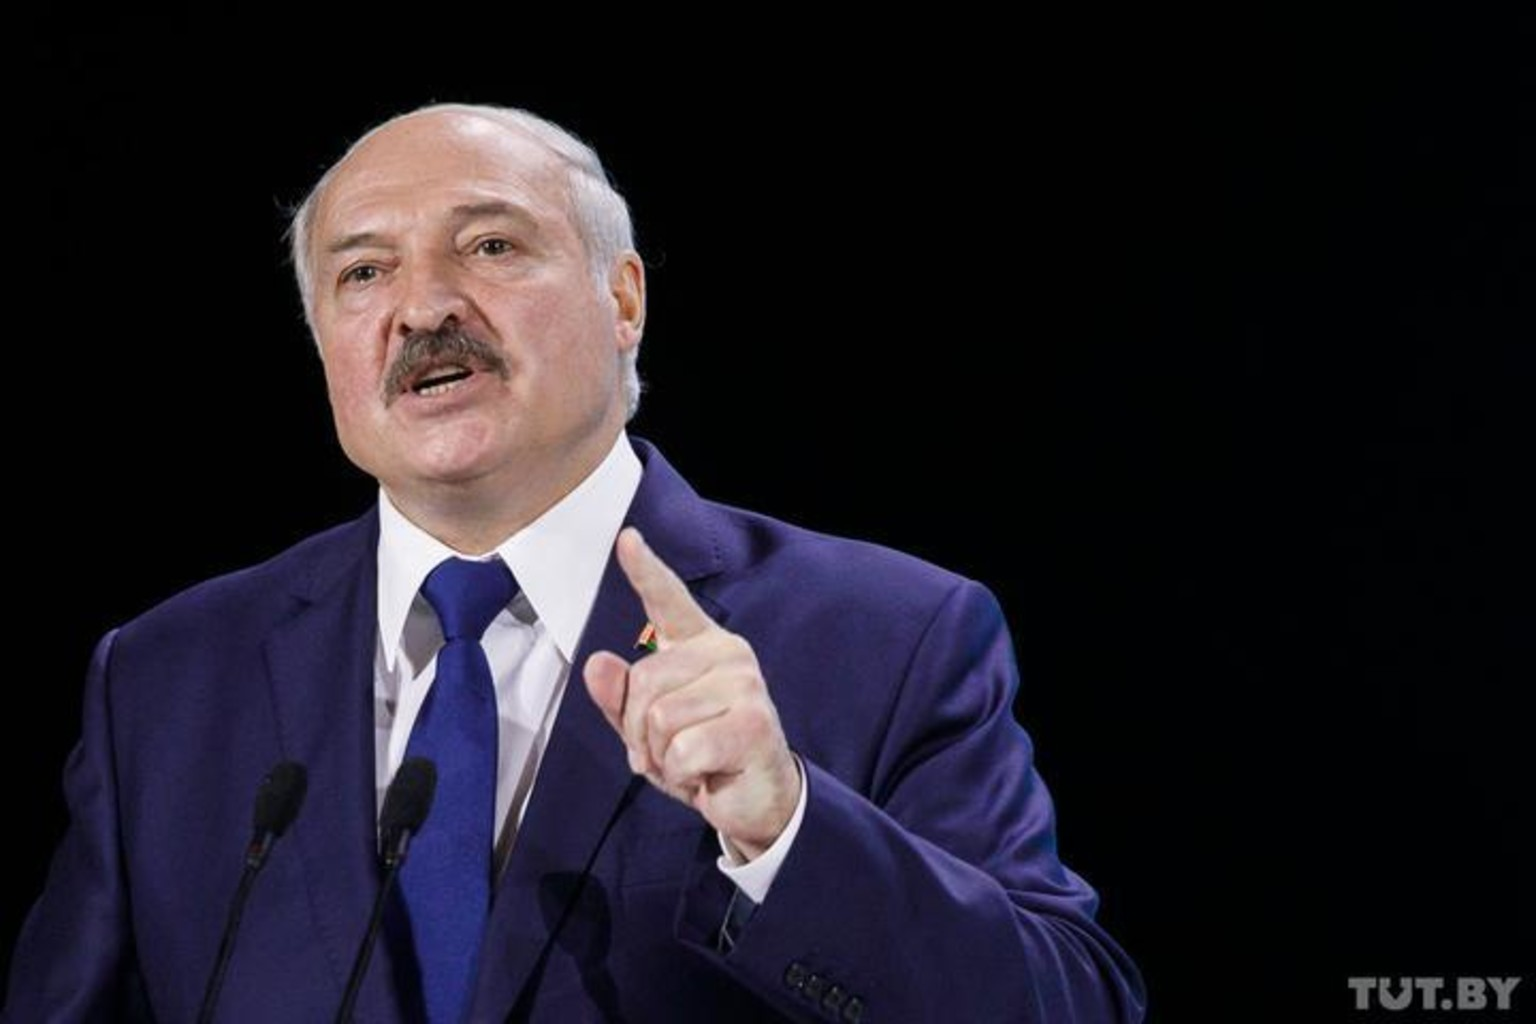 Lukashenko 20191004 shuk tutby phsl 1497